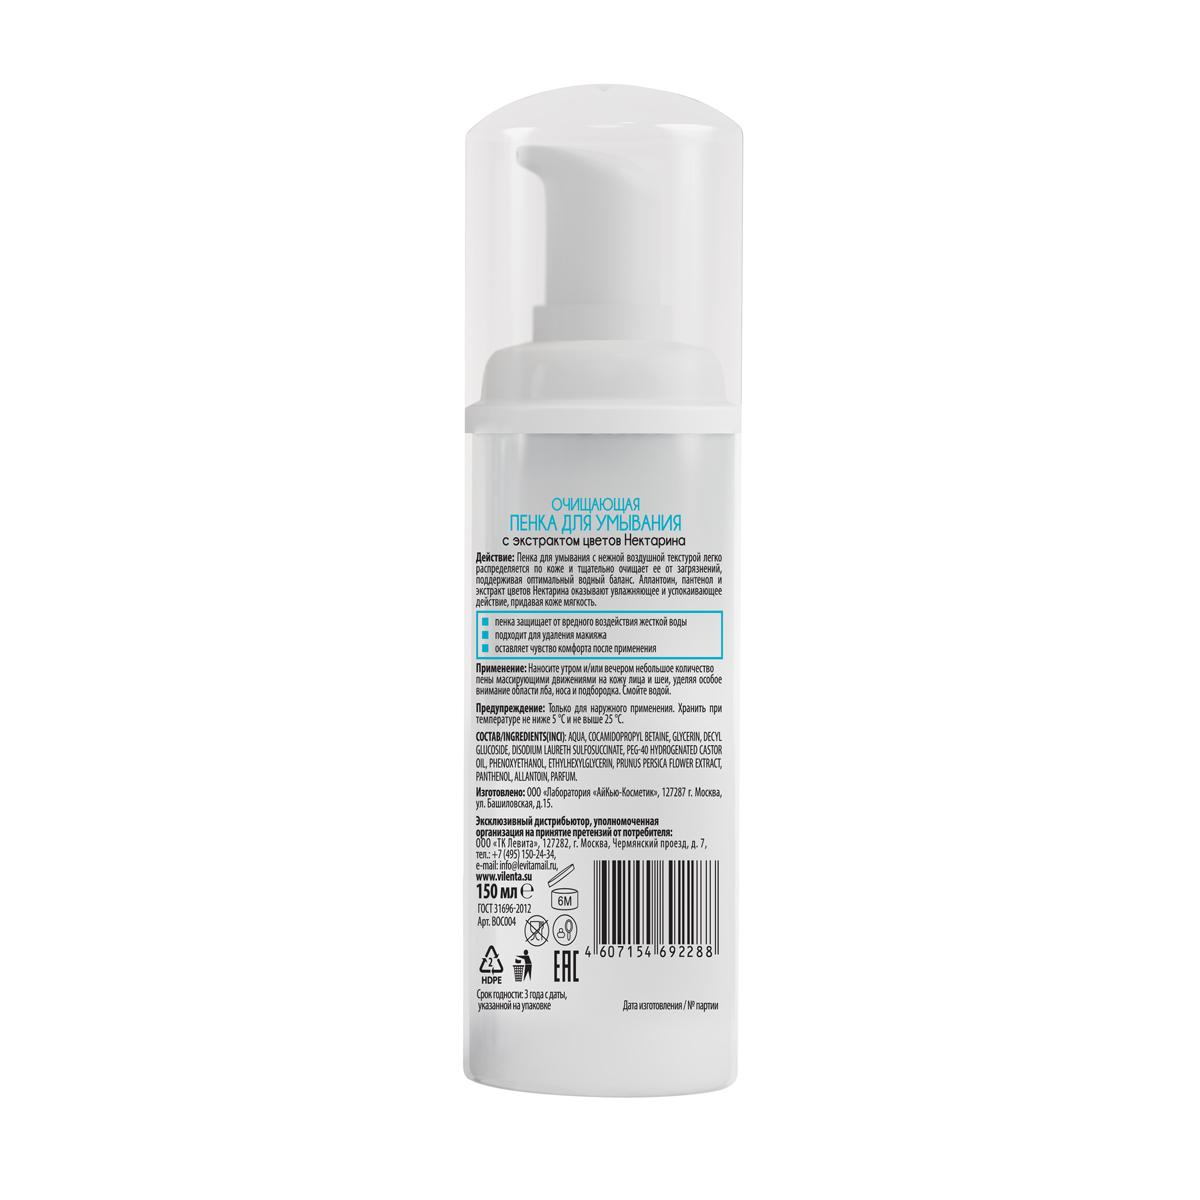 Vilenta Пенка для умывания для всех типов кожи Bloom, 150 мл